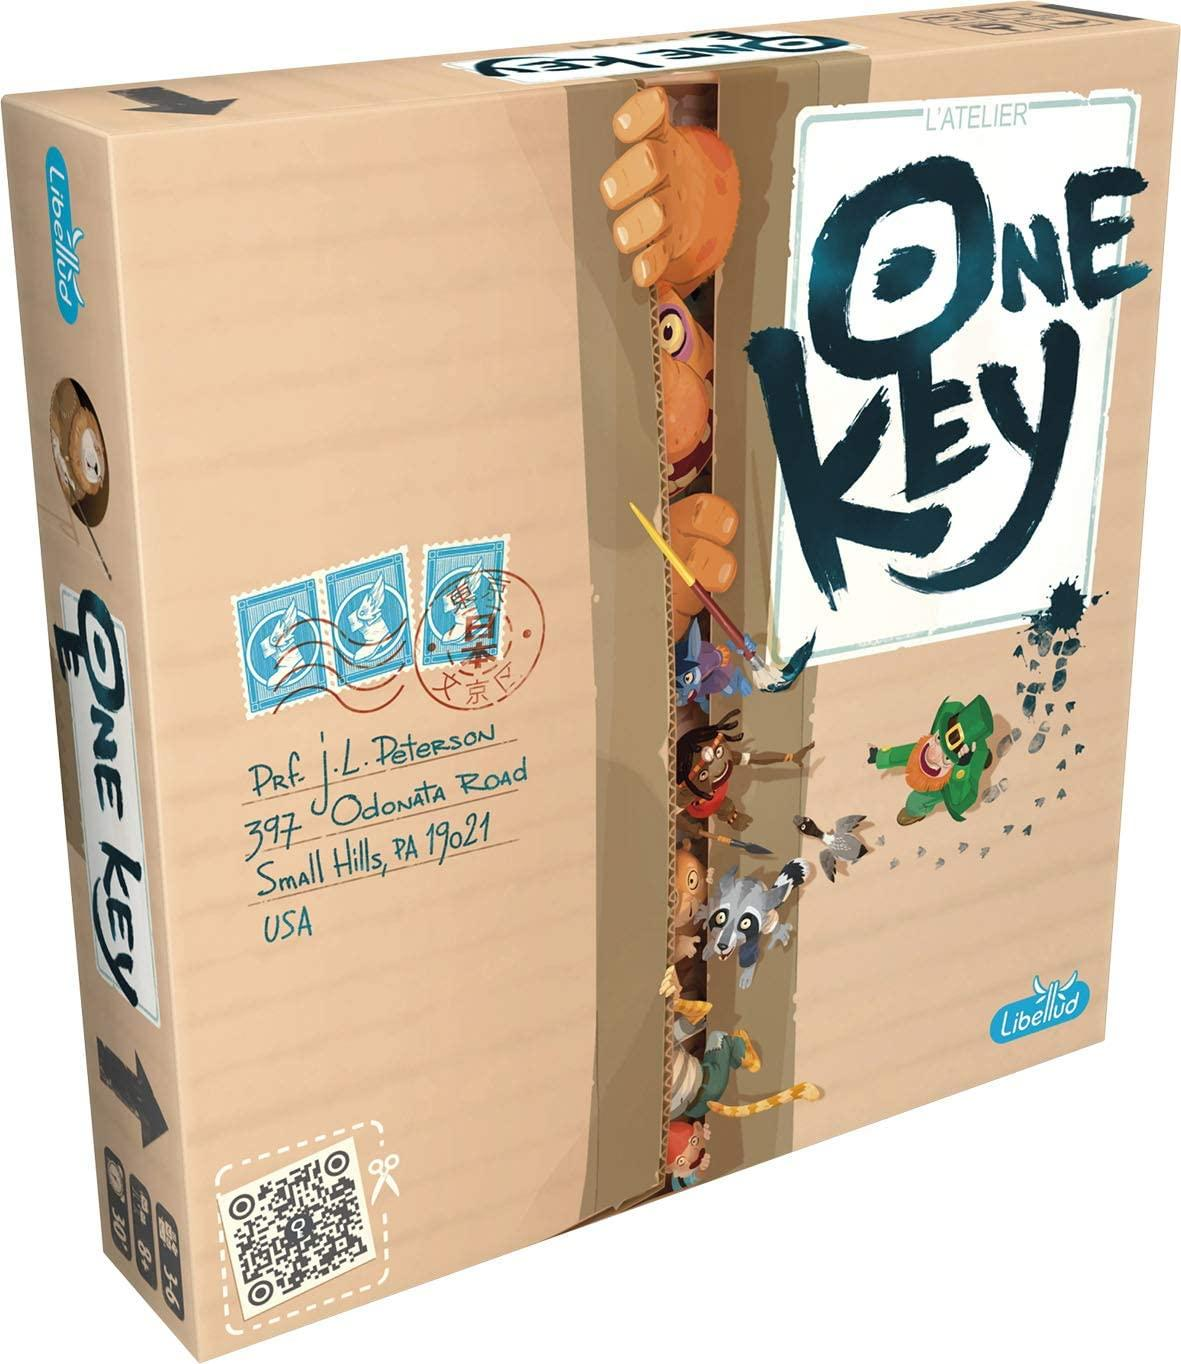 Onekey1